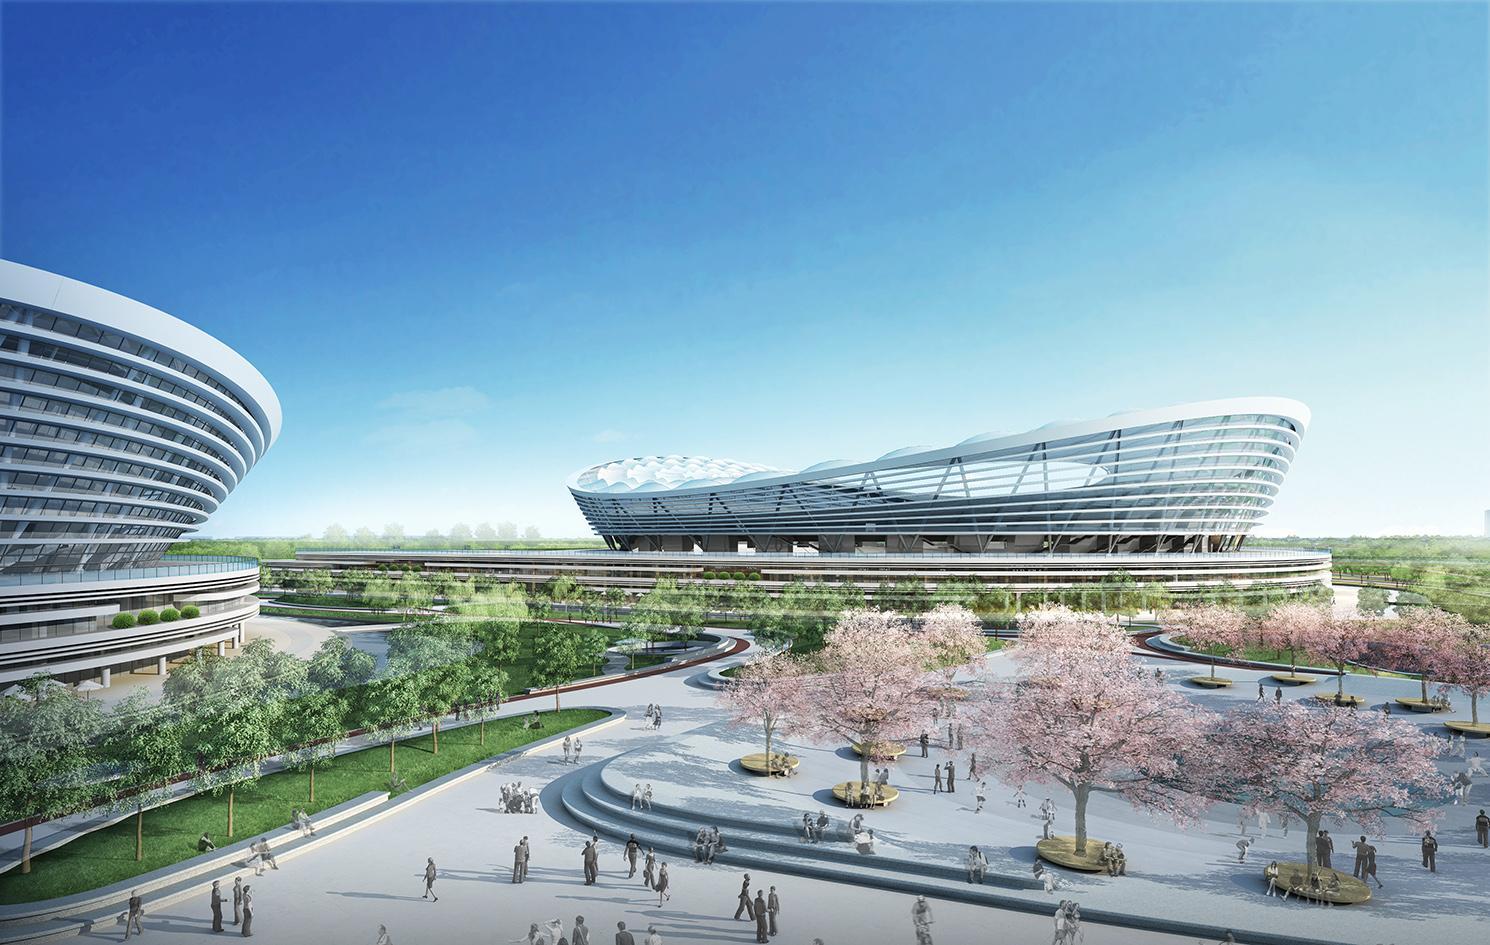 Design suzhou olympic sc stadium - Gmp architektur ...